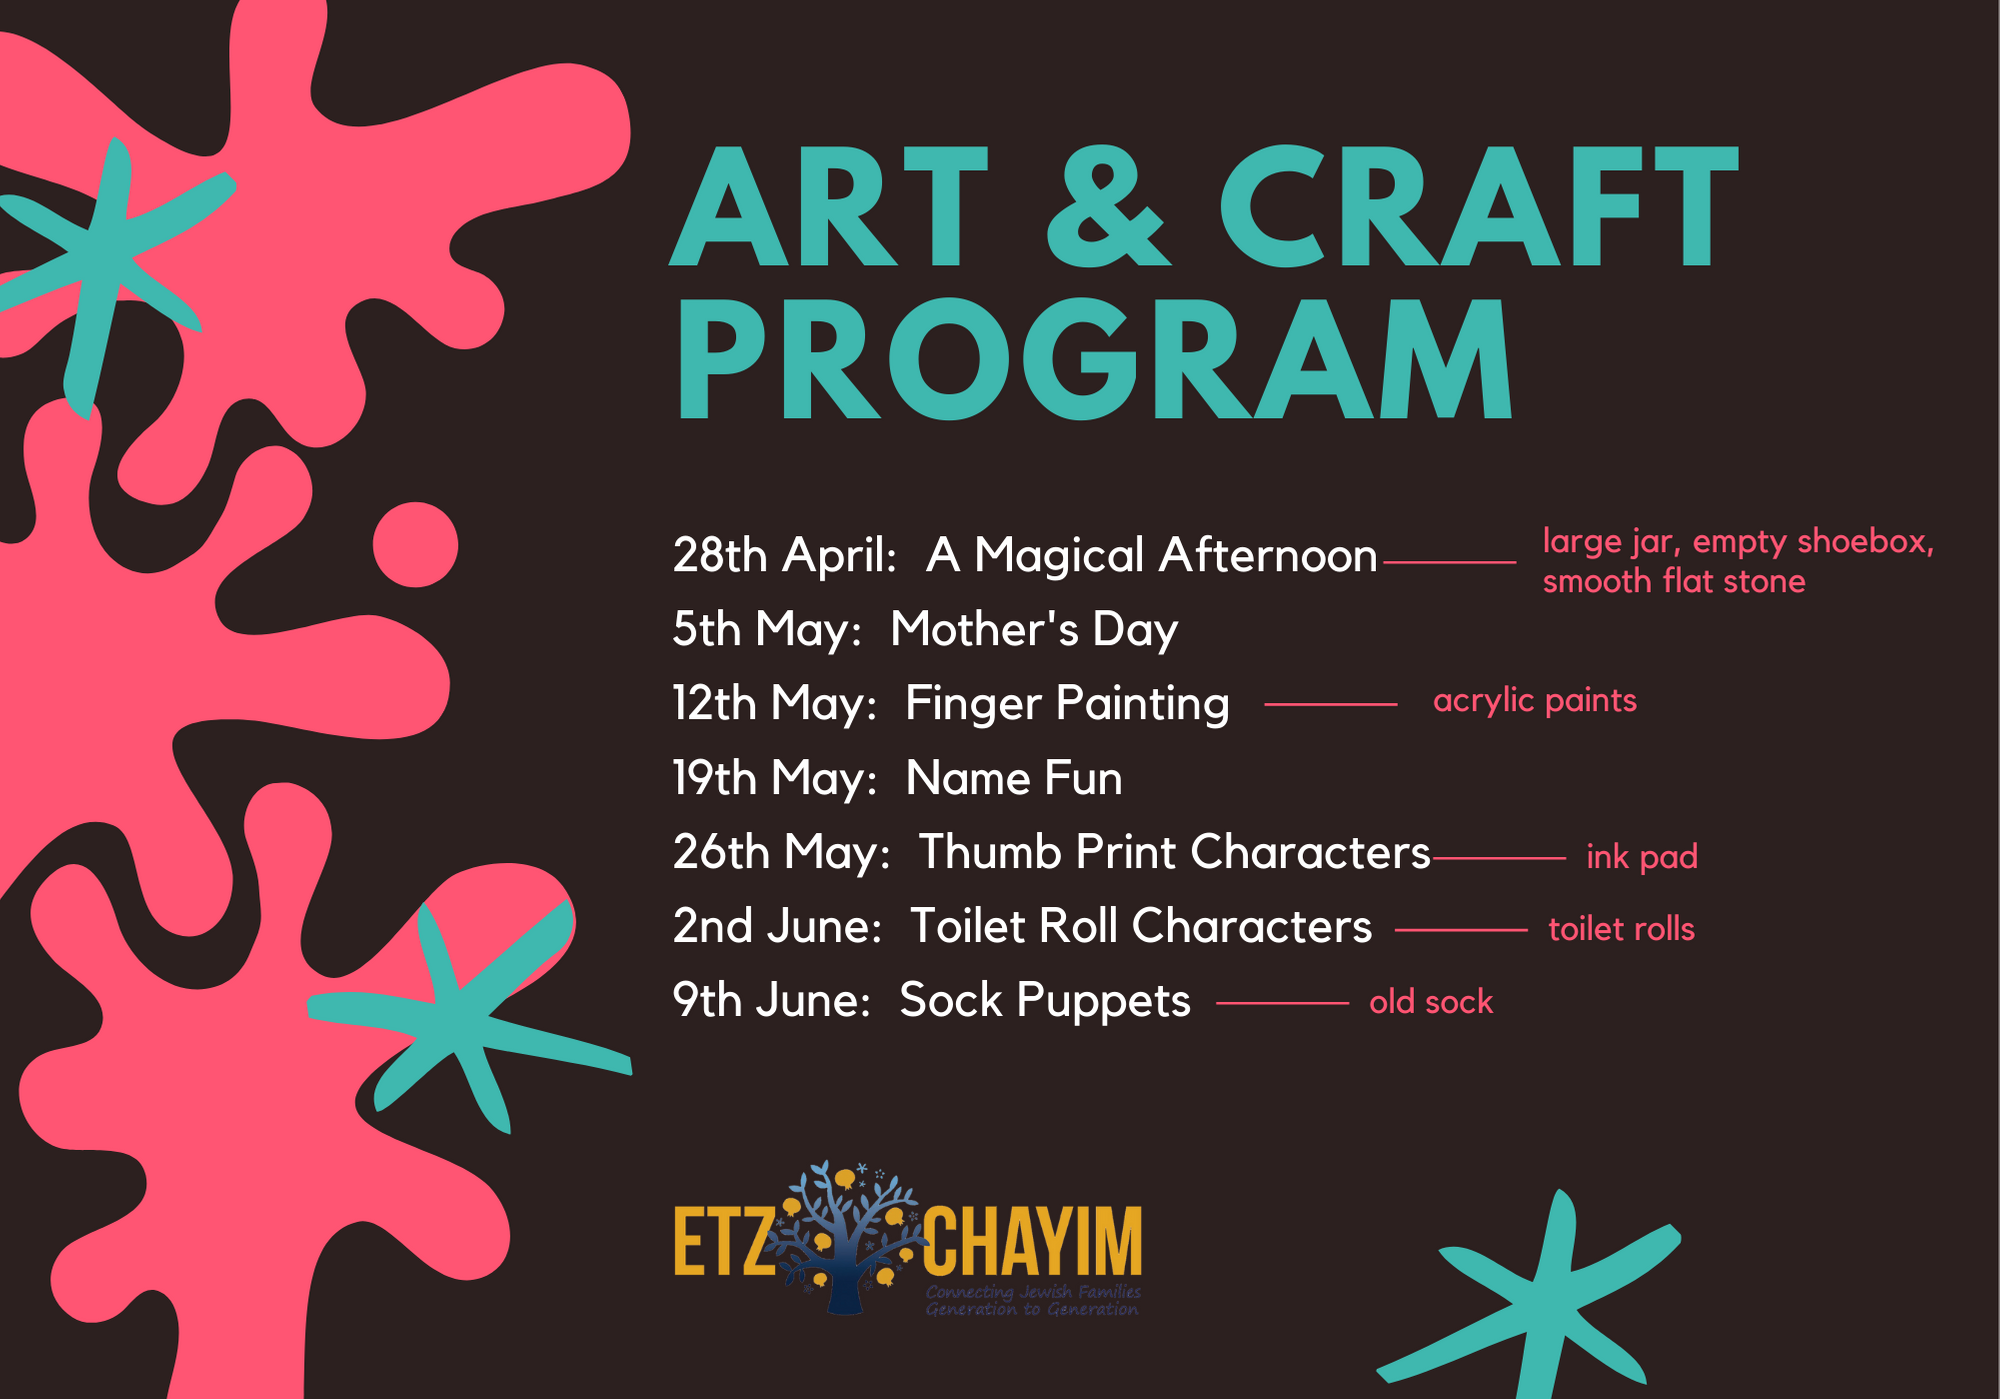 Art & Craft Program 3